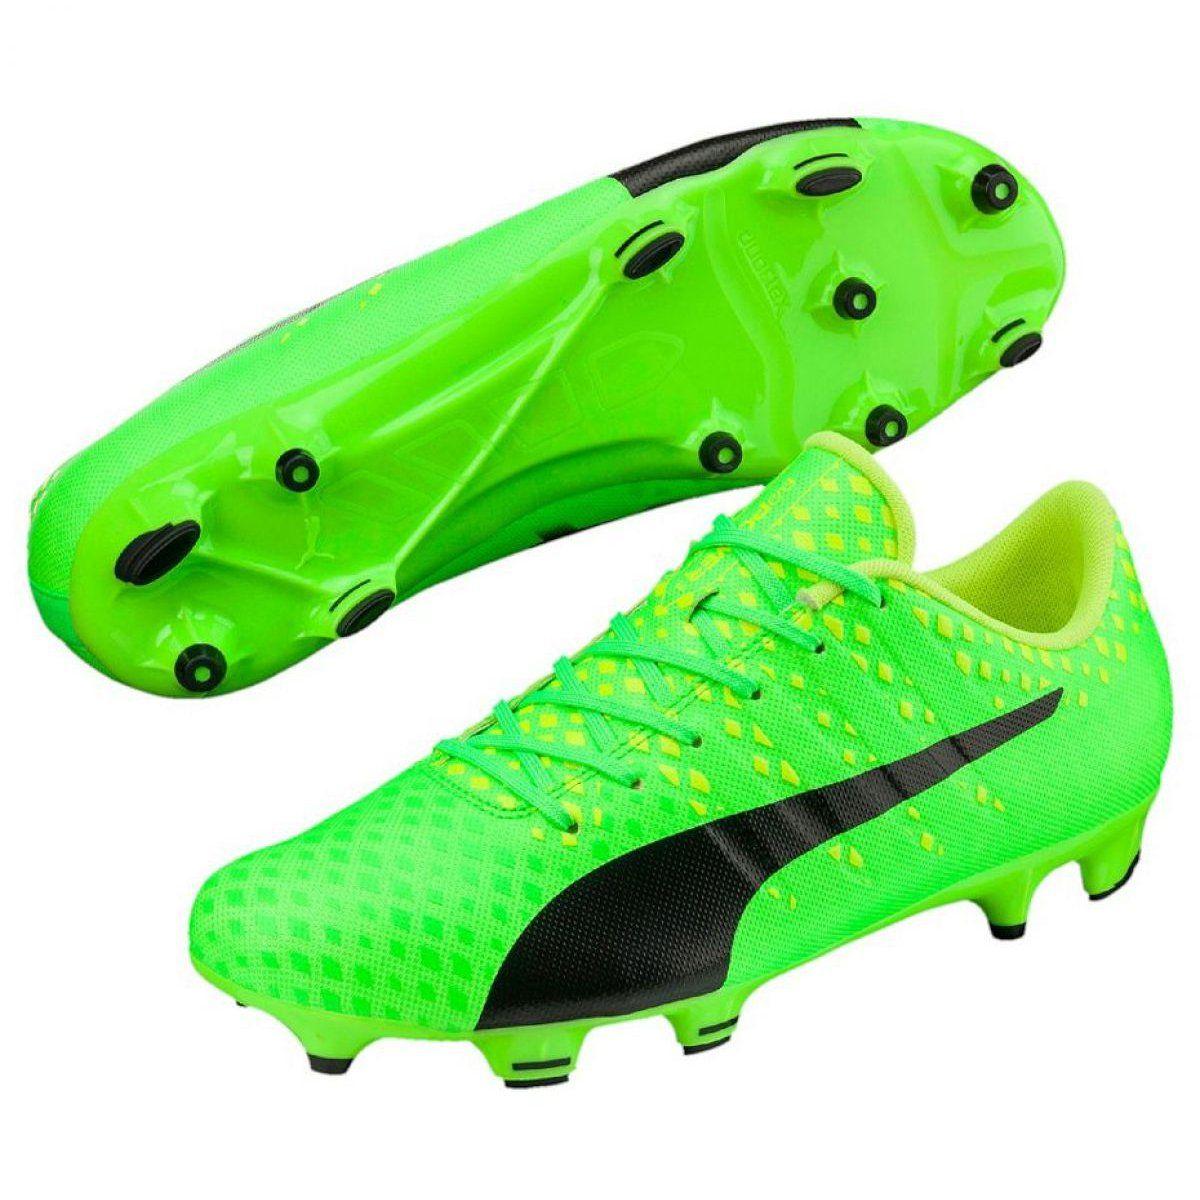 Buty Pilkarskie Puma Evo Power 3 Fg 103956 01 Zielone Zielone Soccer Shoes Shoes Shoes Mens